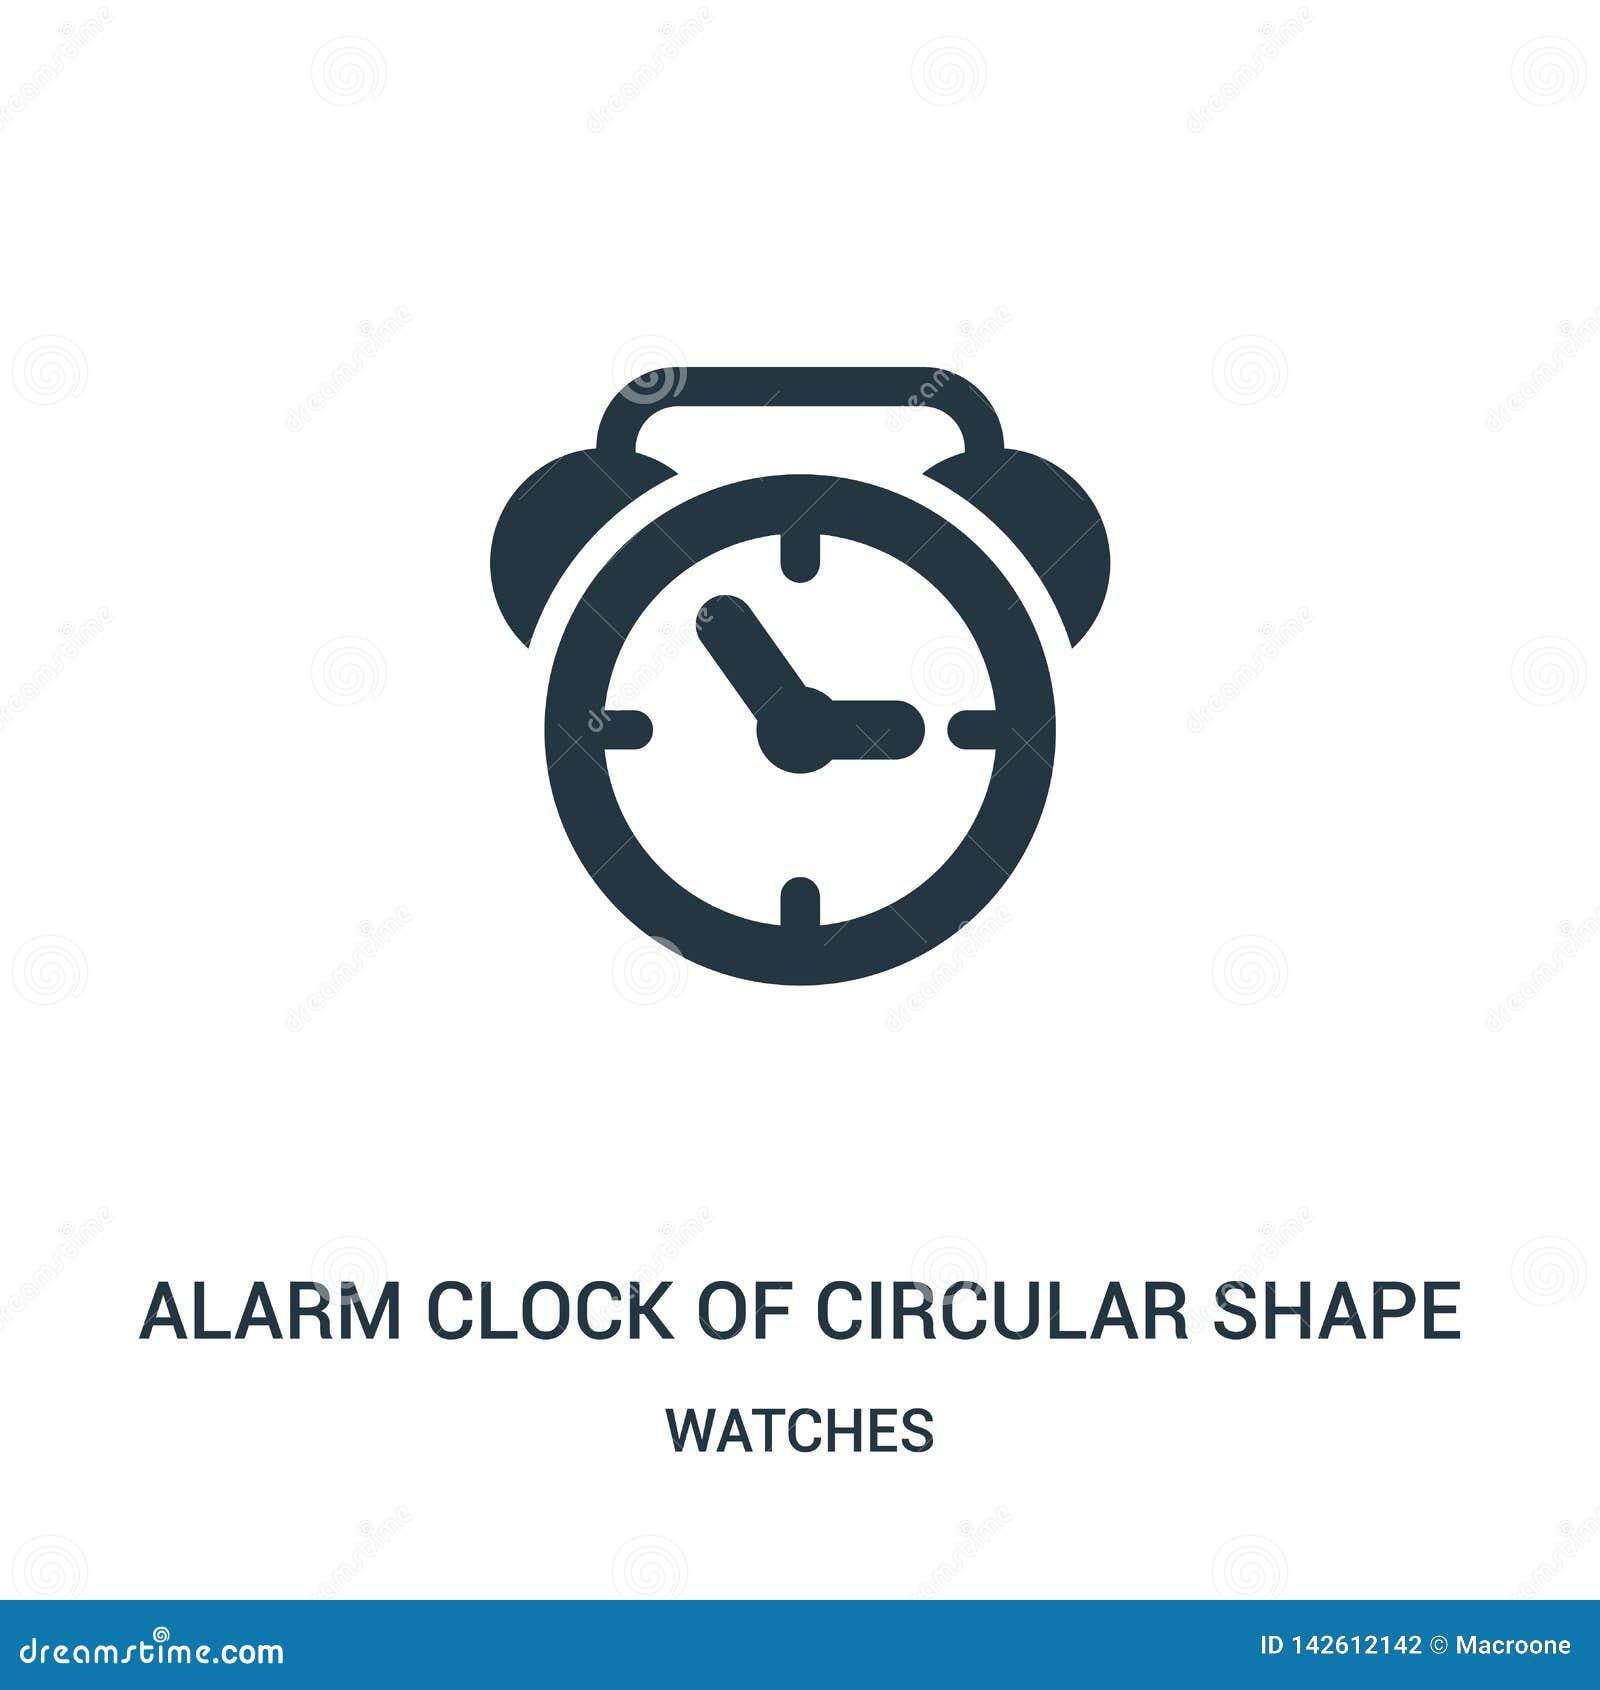 Despertador del vector del icono de la forma circular de la colecci?n de relojes L?nea fina despertador de vector del icono del e